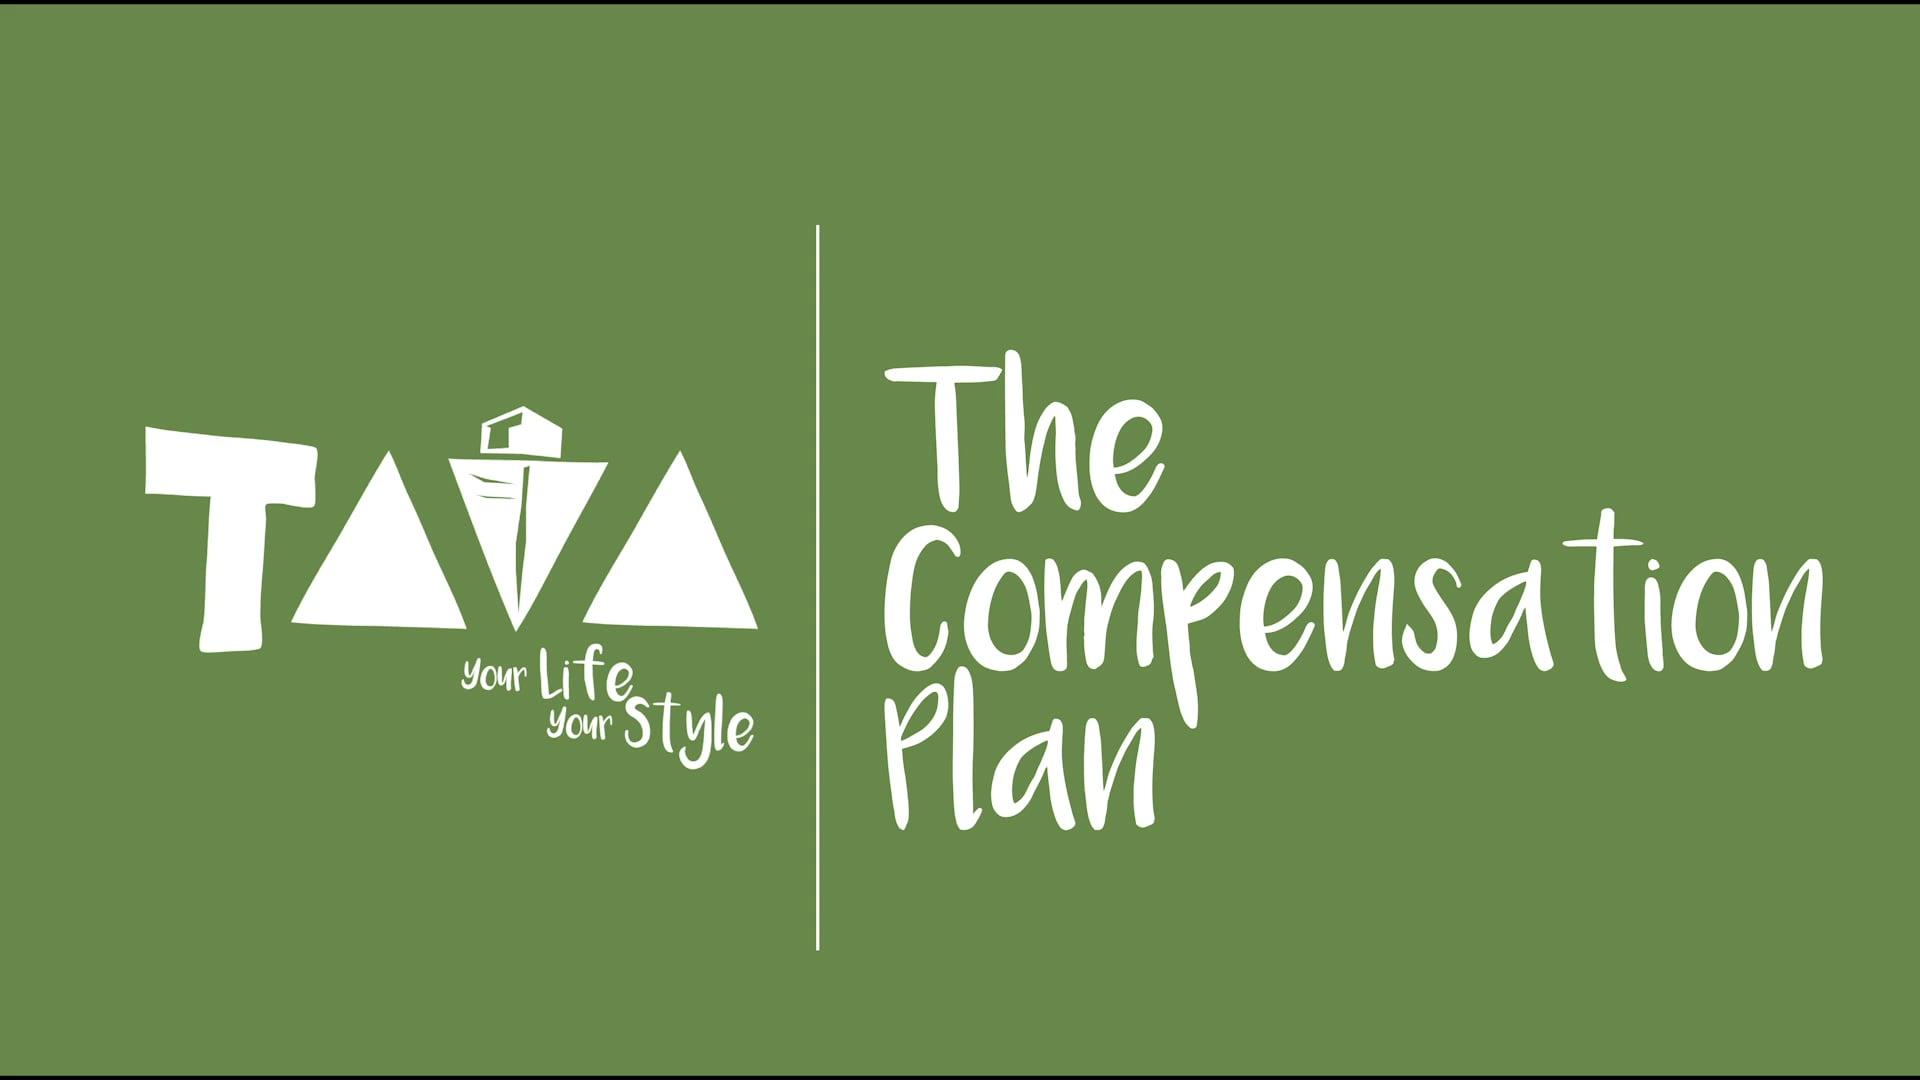 Tava Compensation Plan - Mark Sterling - CoCo Studios